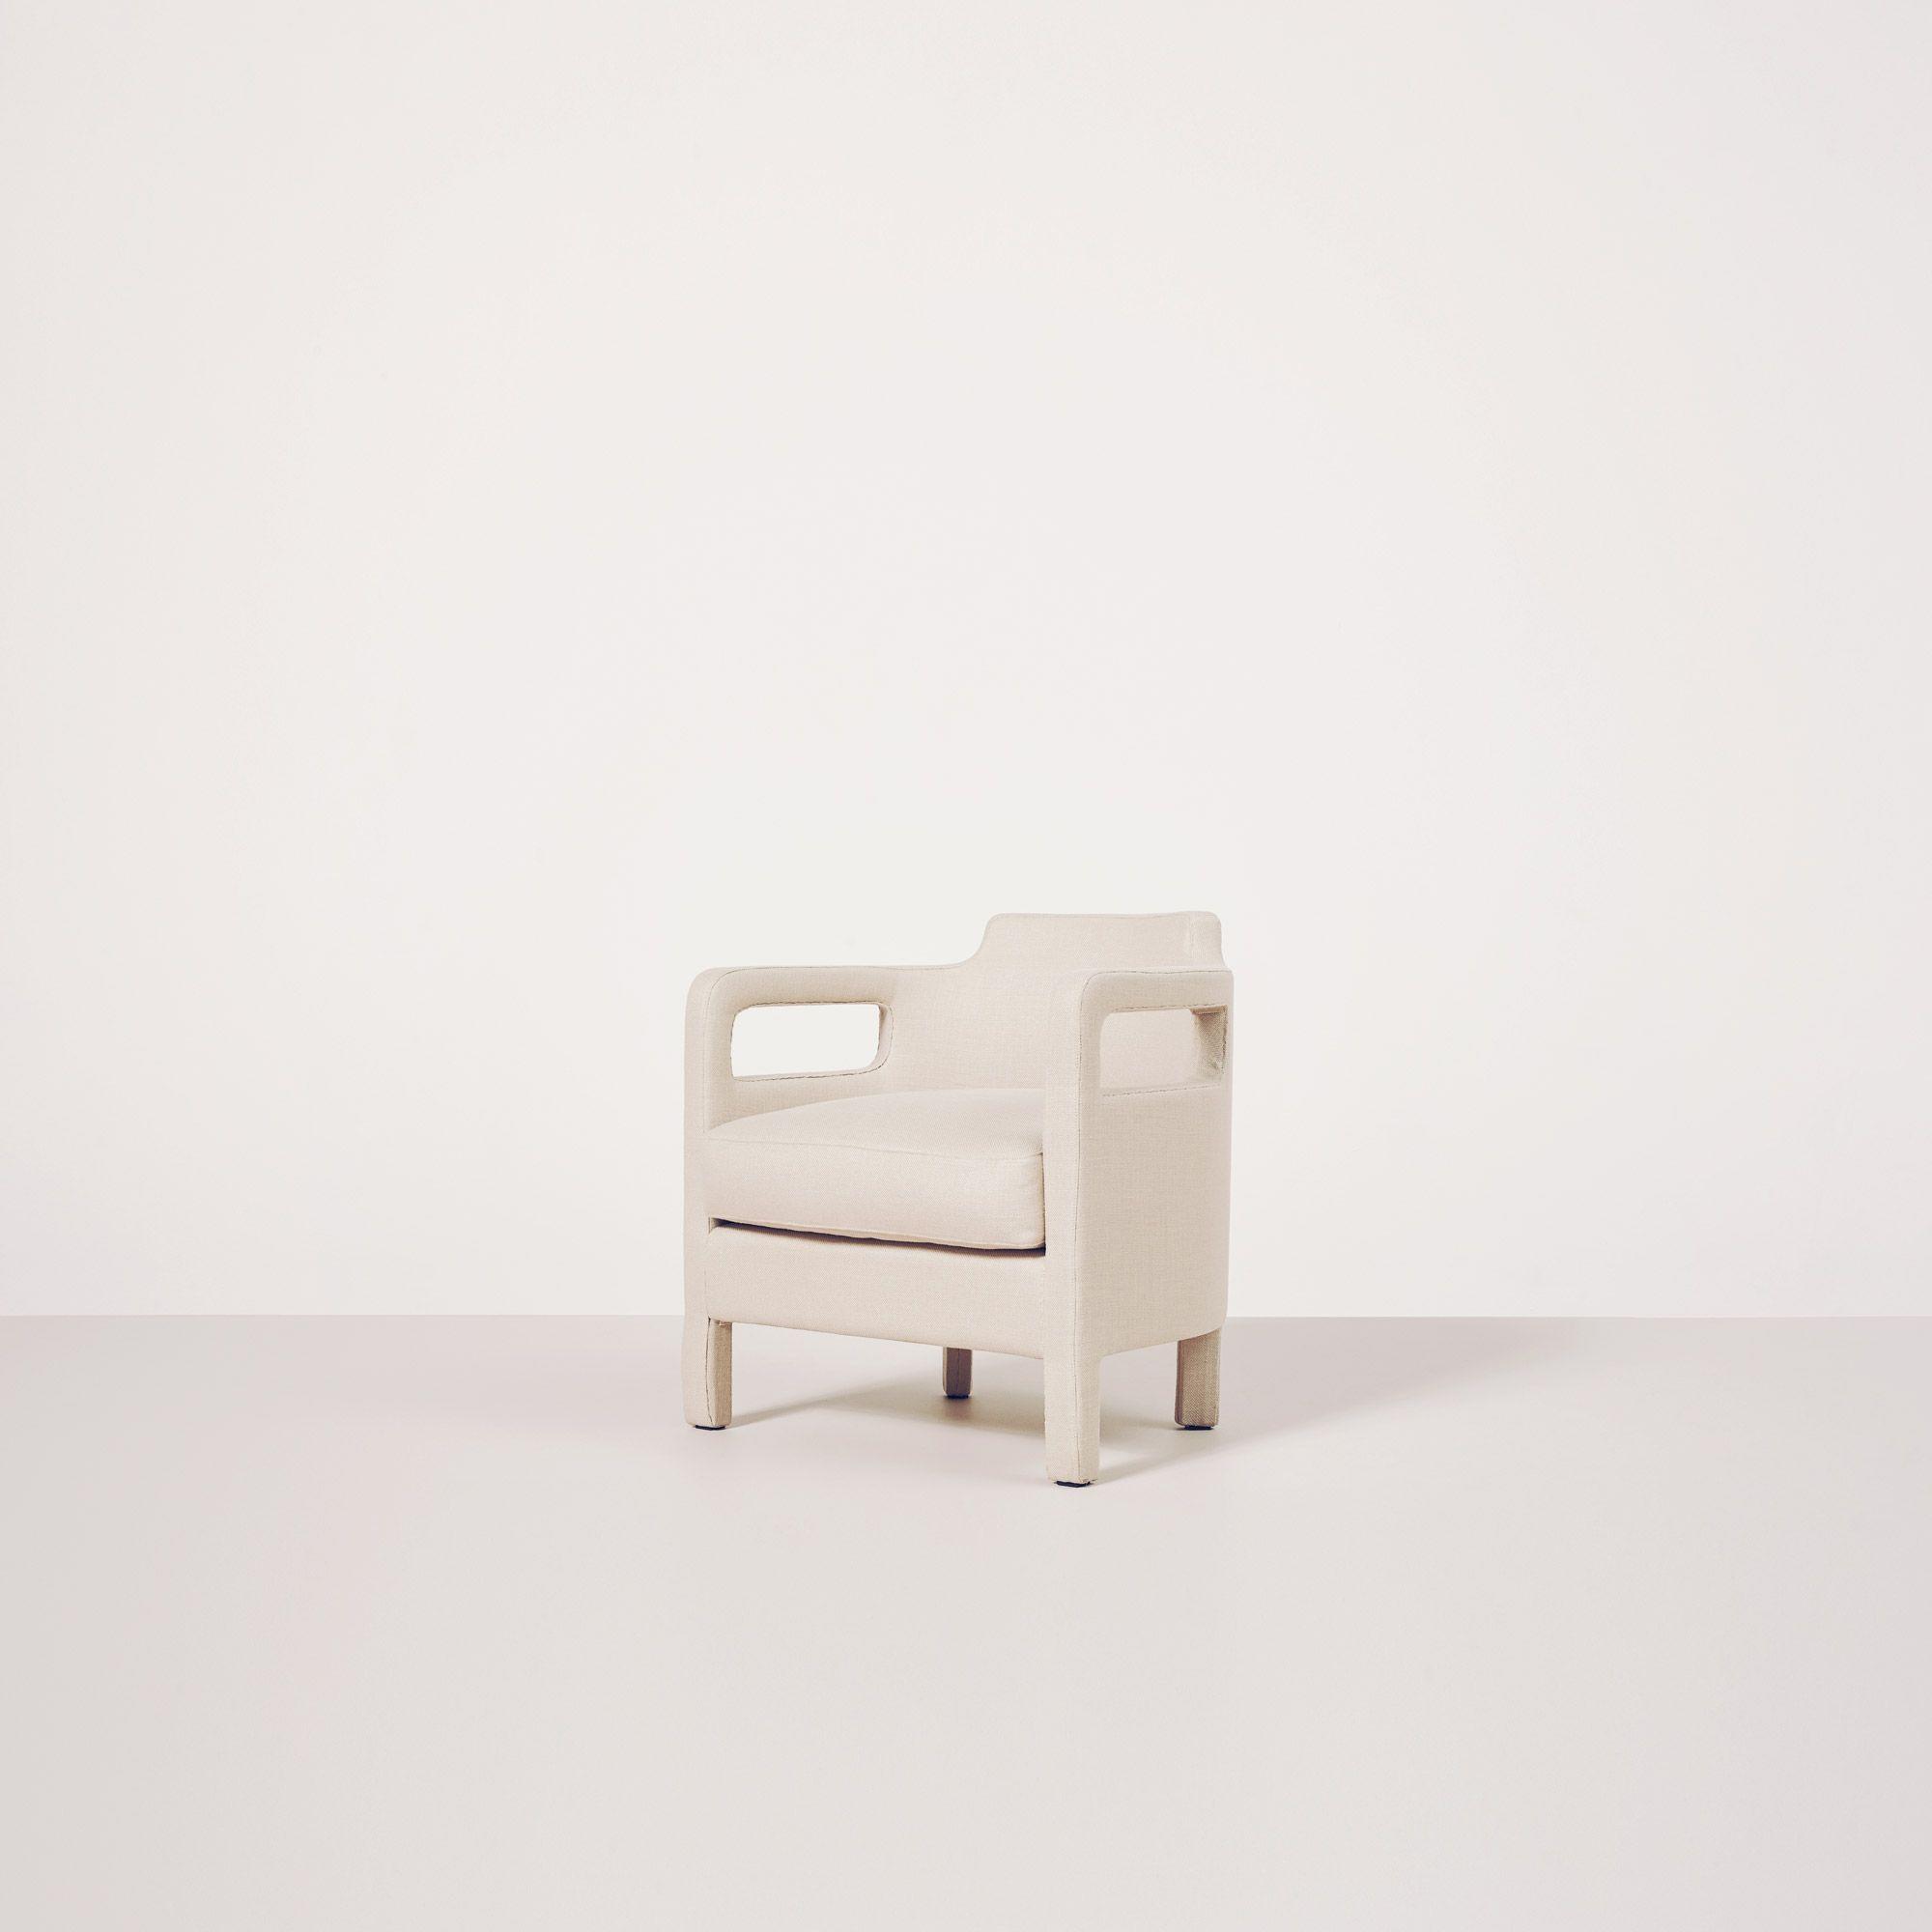 Jinbao Street Lounge Chair by Avenue Road